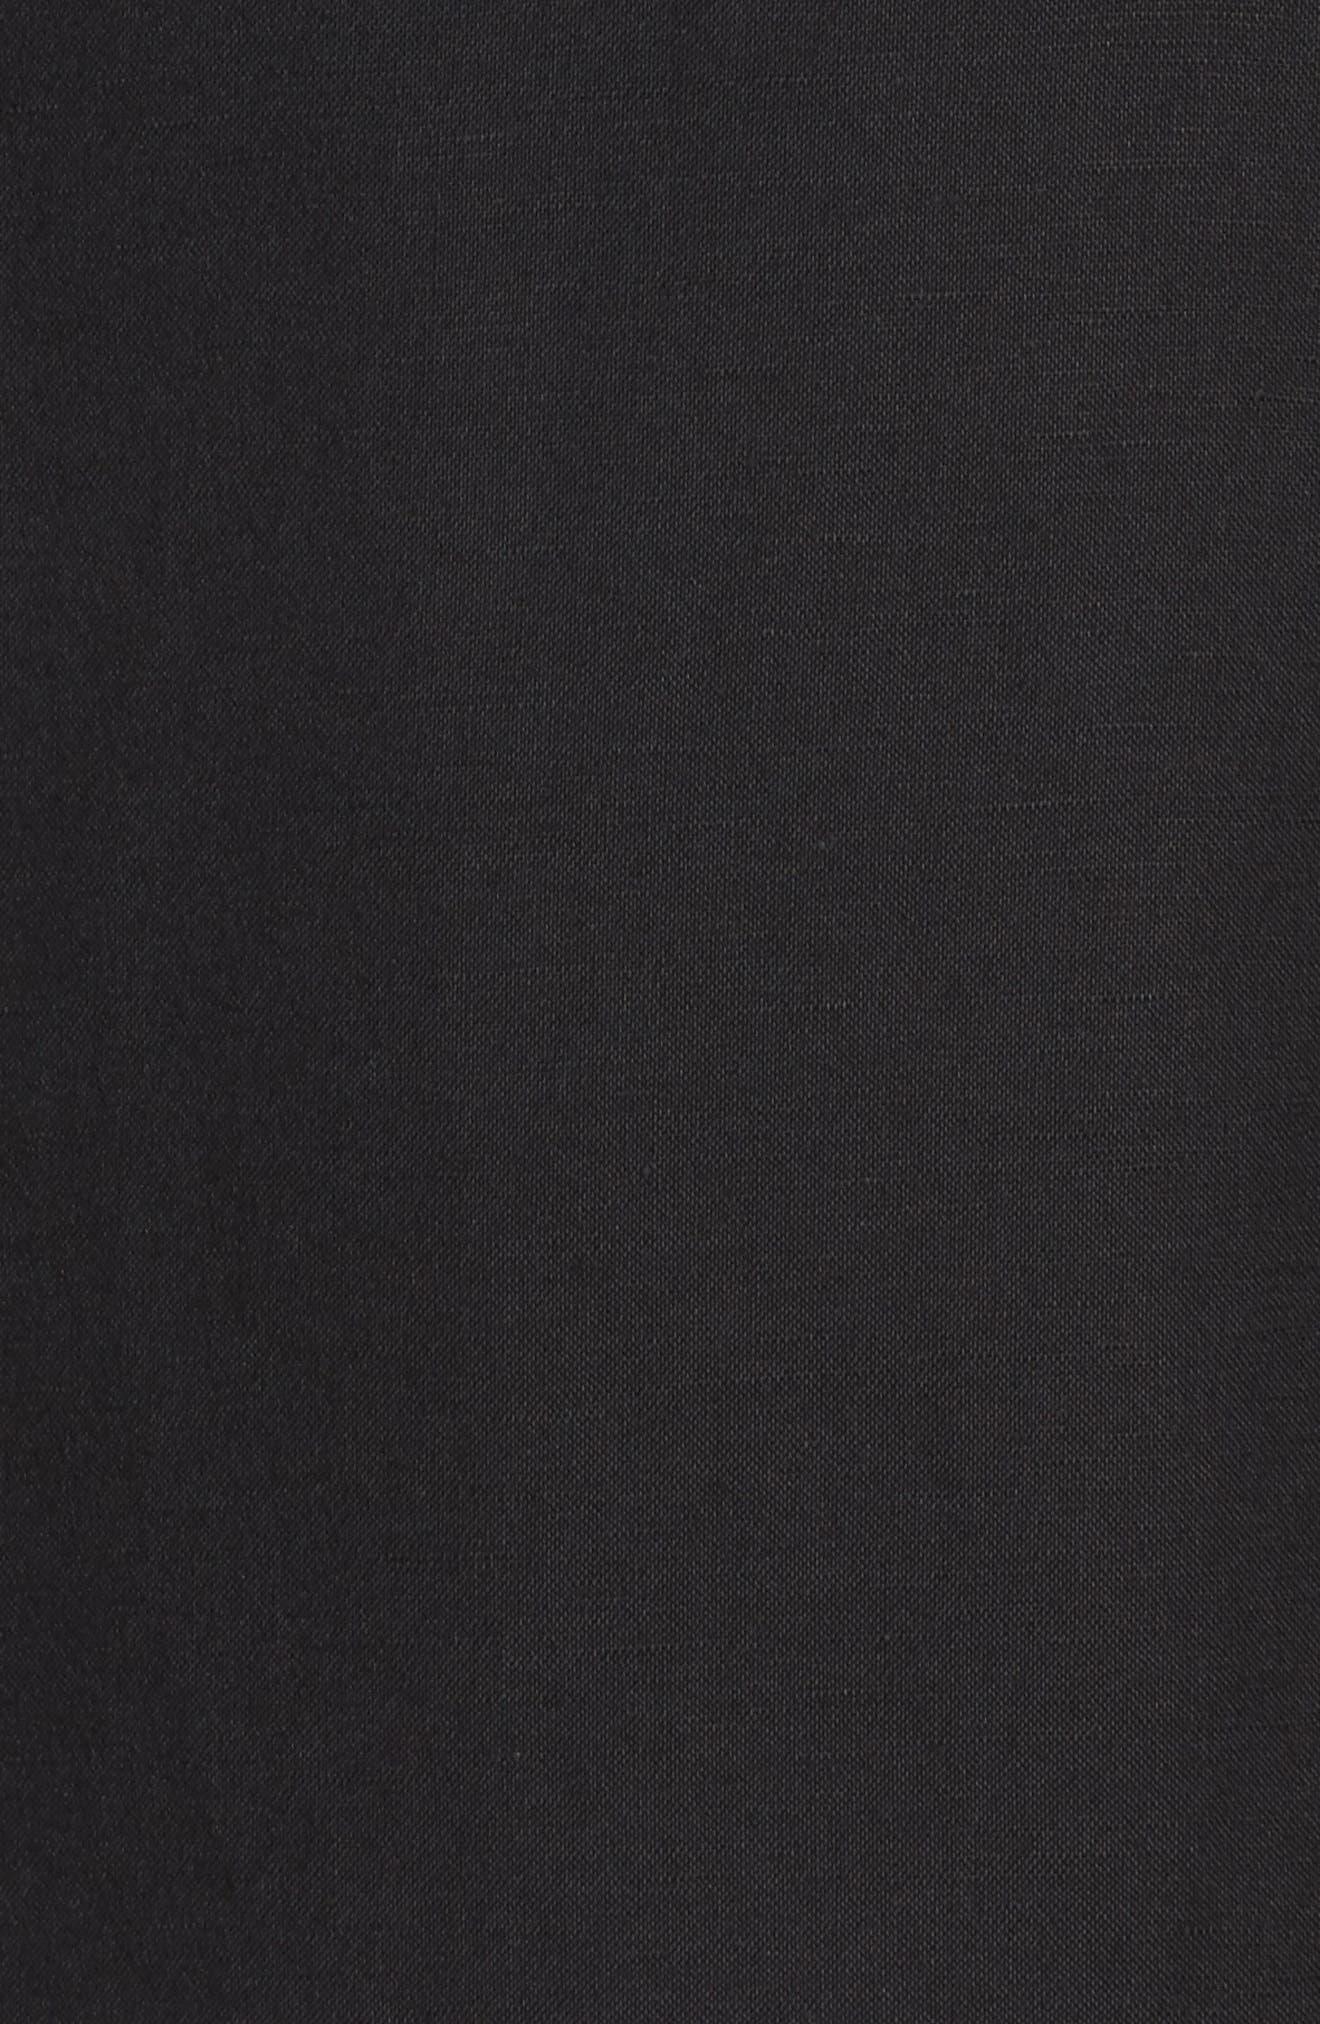 Mandarin Collar Linen Blend Sheath Dress,                             Alternate thumbnail 5, color,                             006